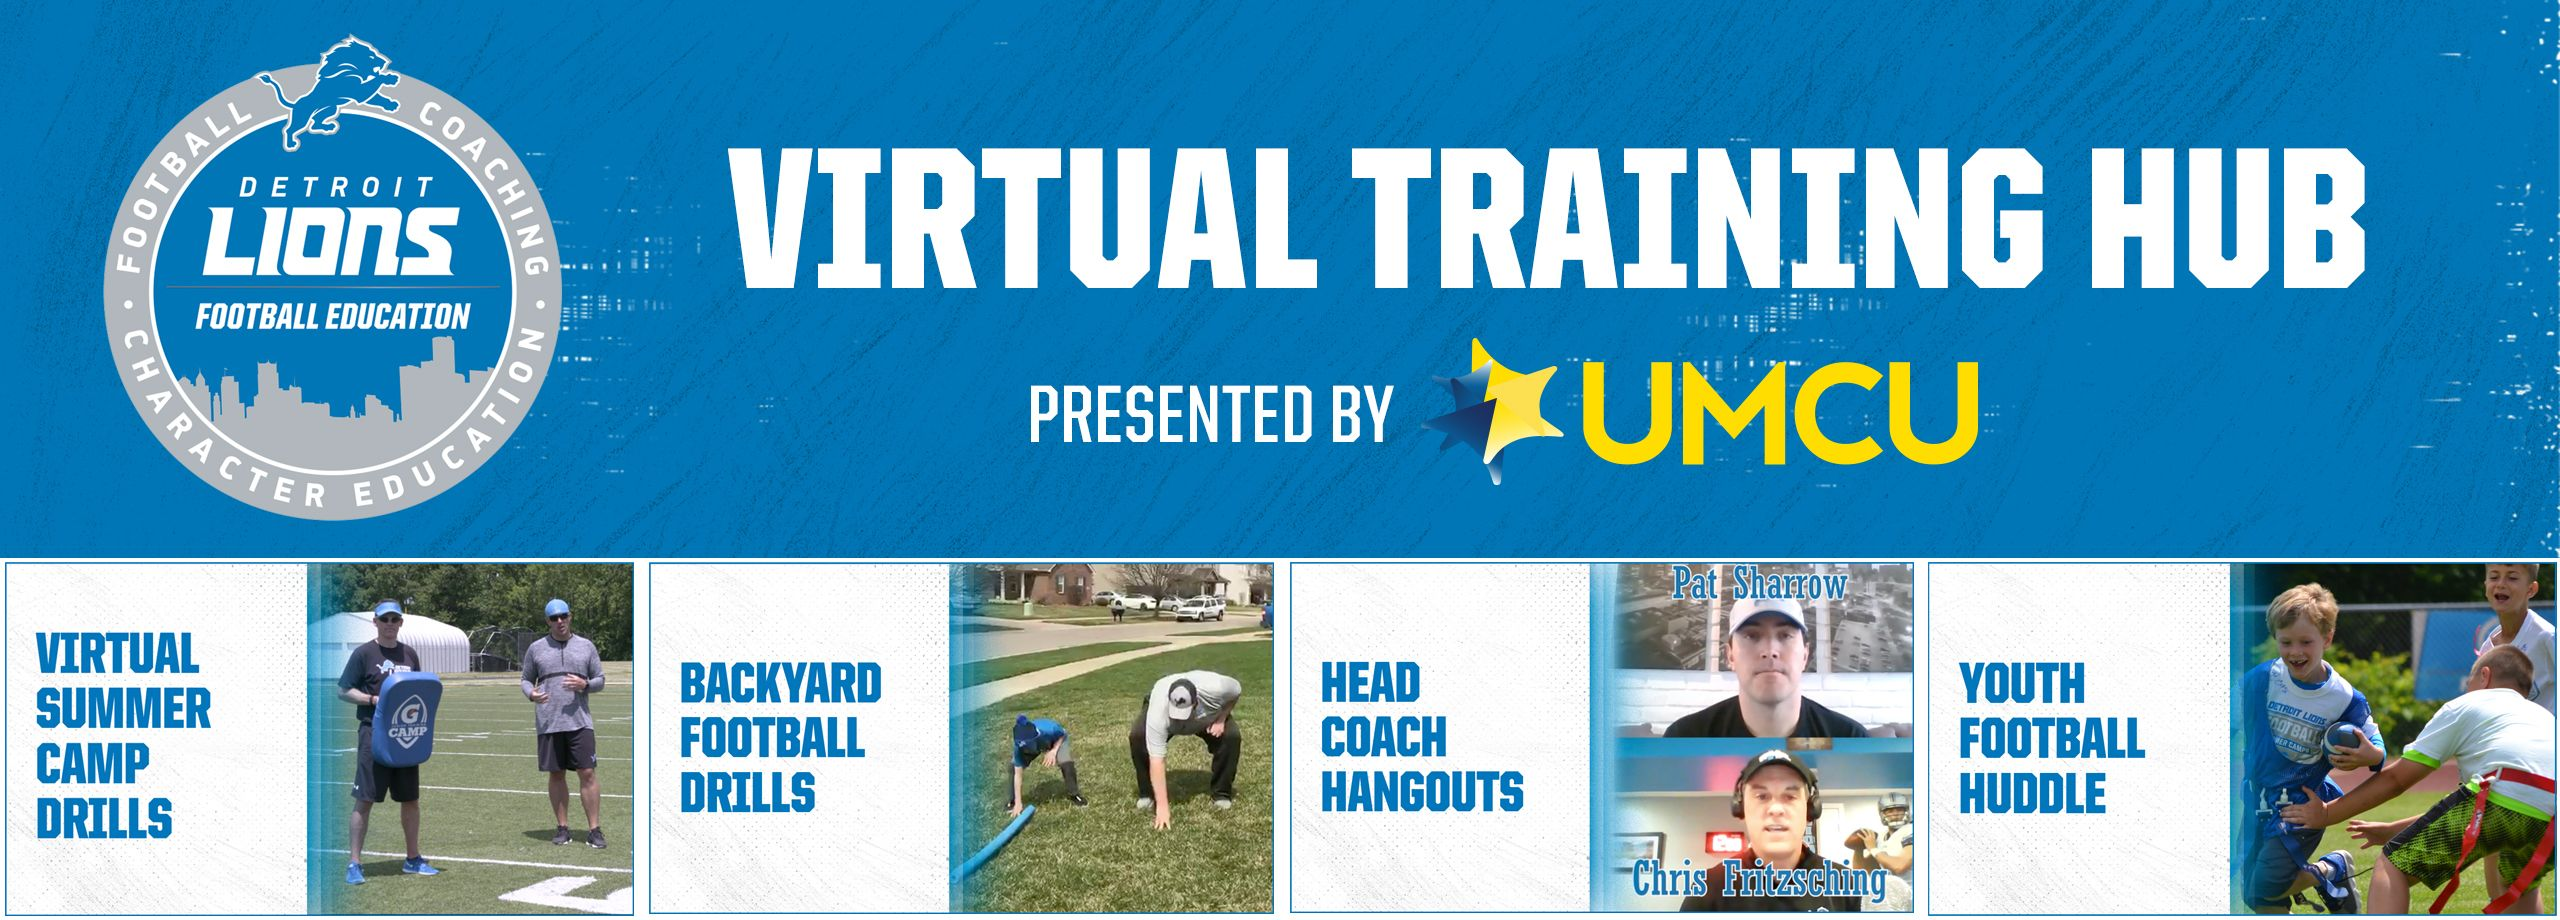 football-education-virtual-training-hub-form-header